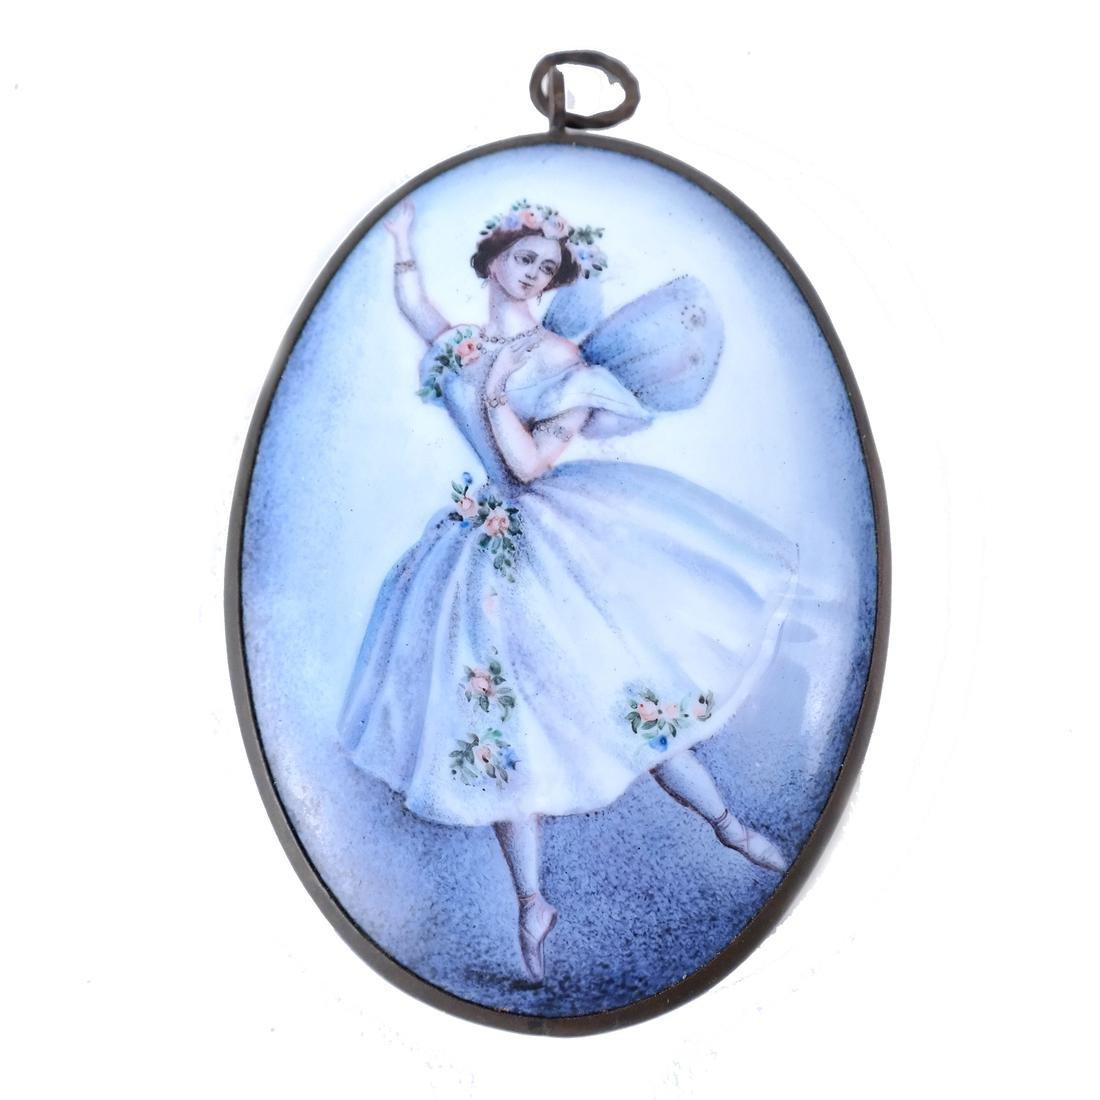 Continental Enameled Ballerina Plaque